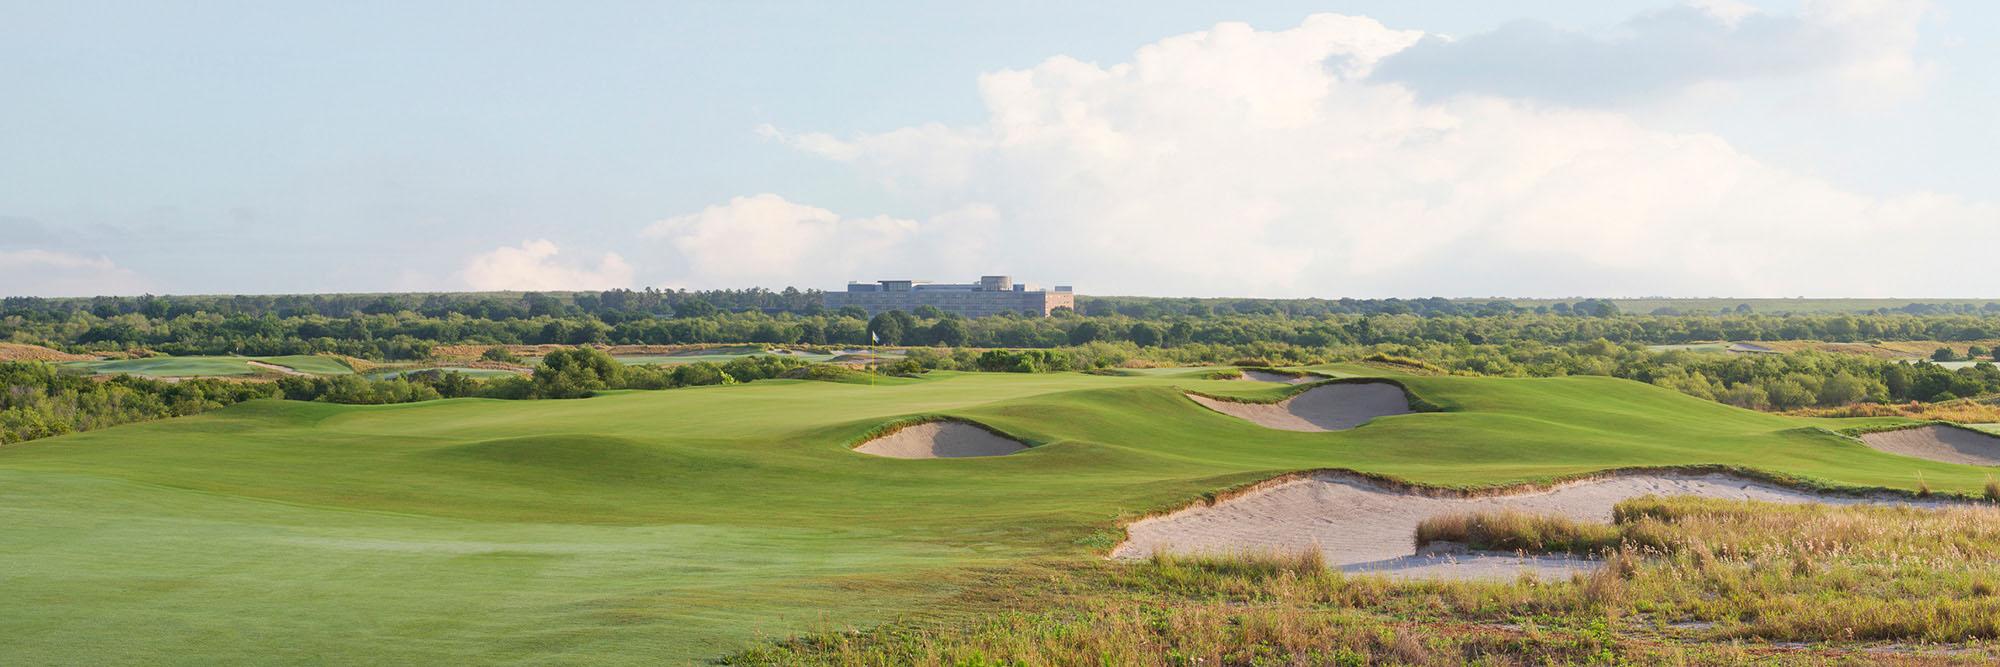 Golf Course Image - Streamsong Blue No. 5